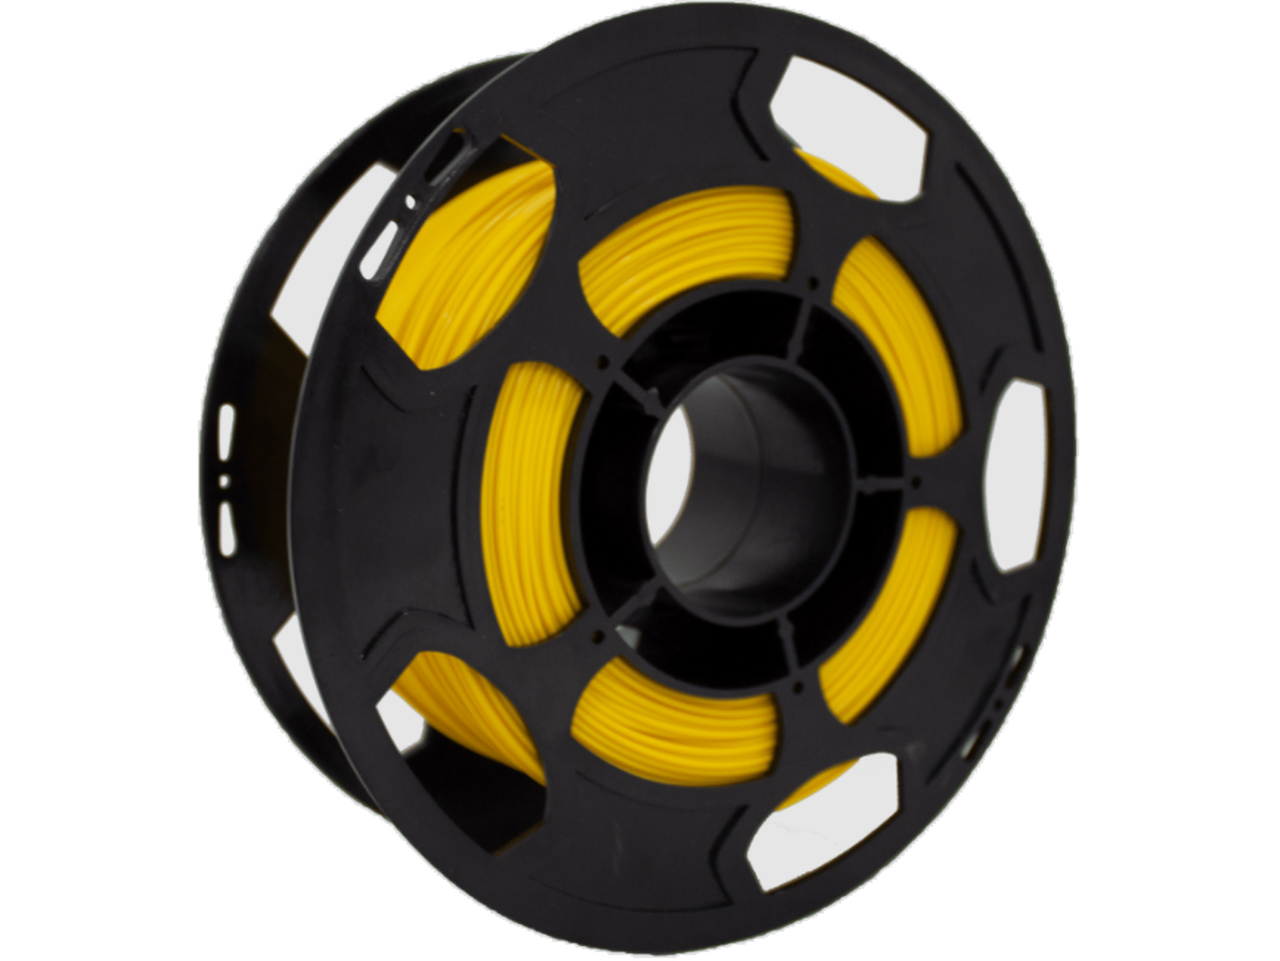 Filamento ABS Premium - Amarelo - 3D Lab - 1.75mm - 500g